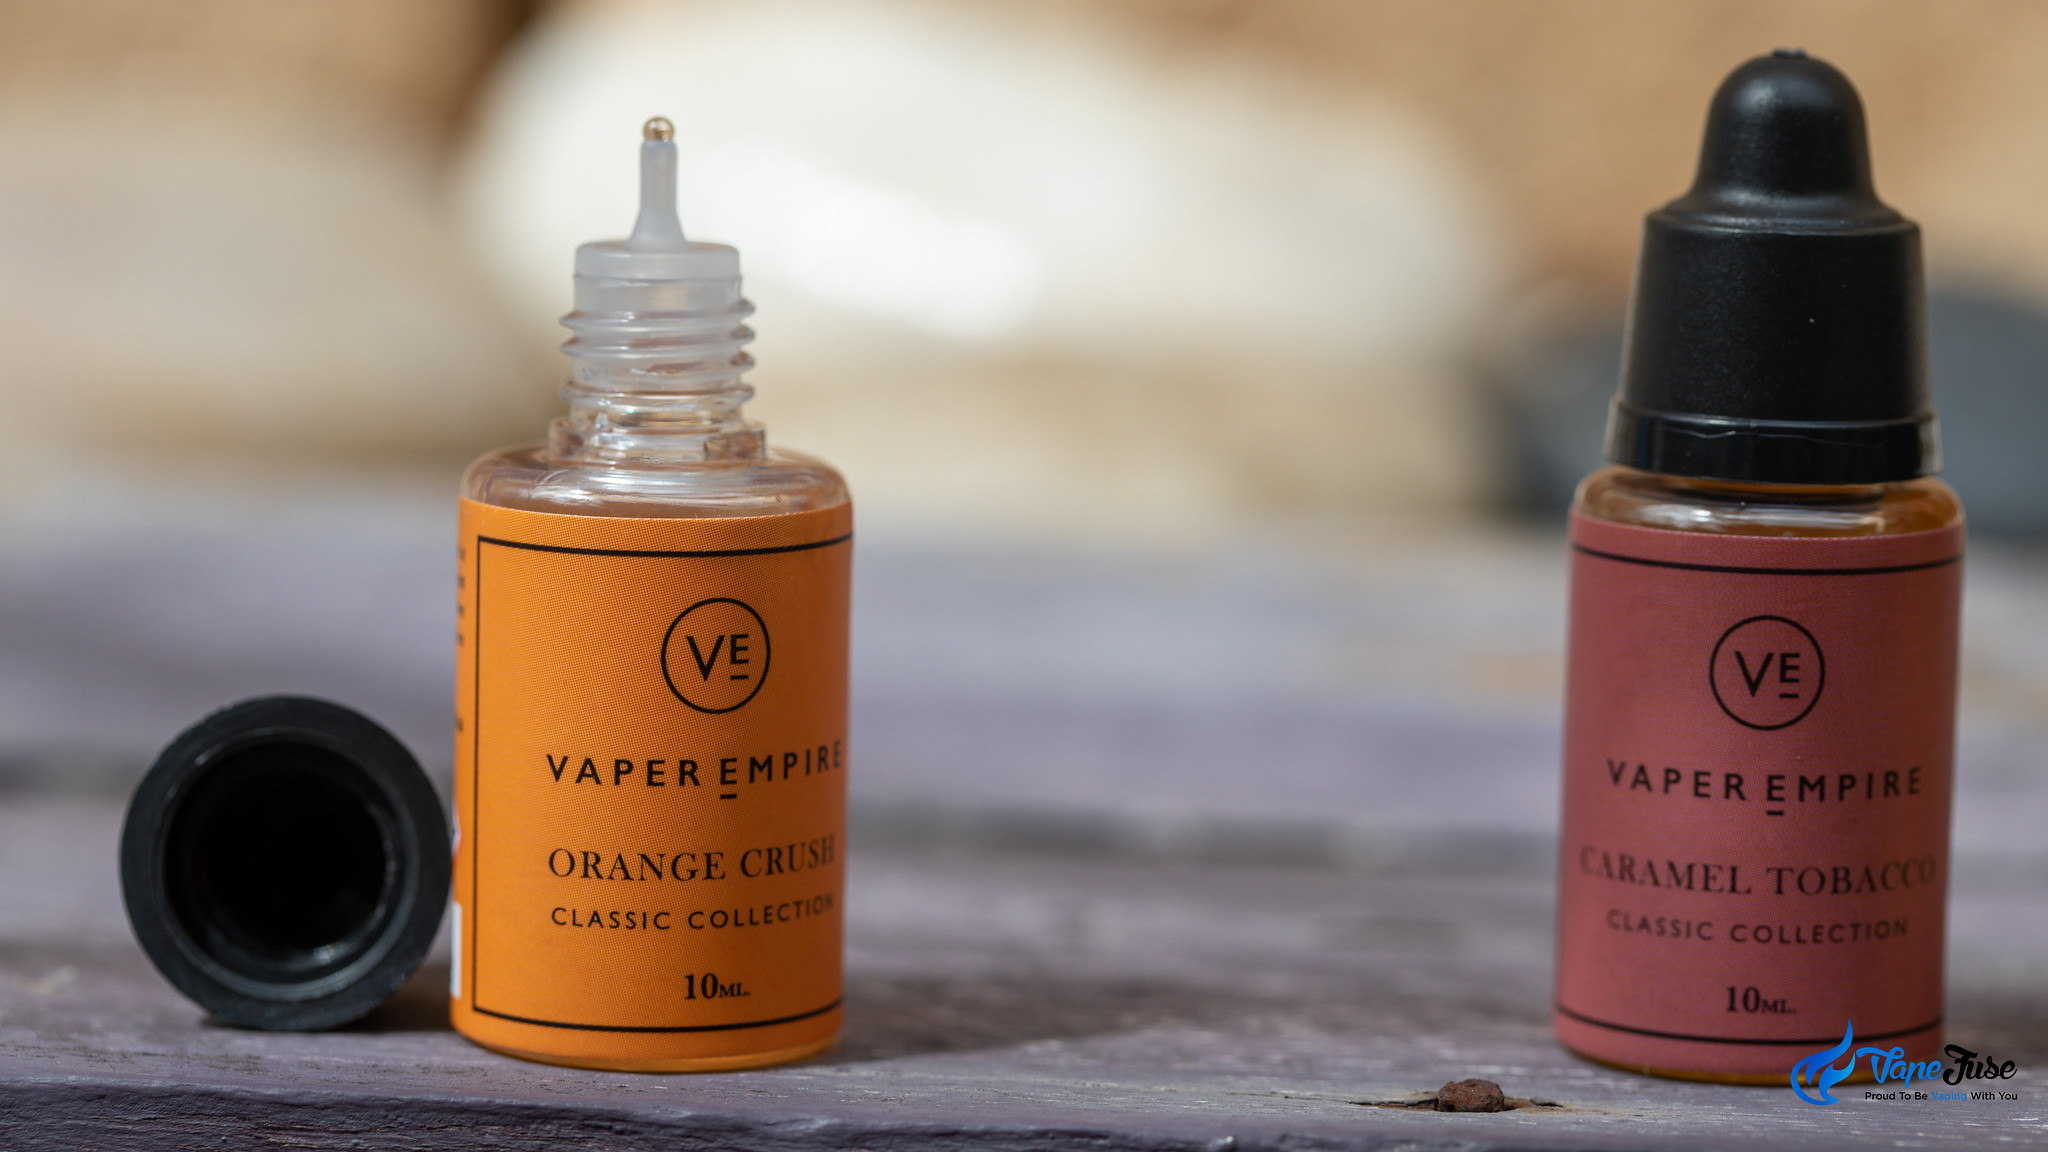 Vaper Empire Classic Collection Orange Crush e-liquid